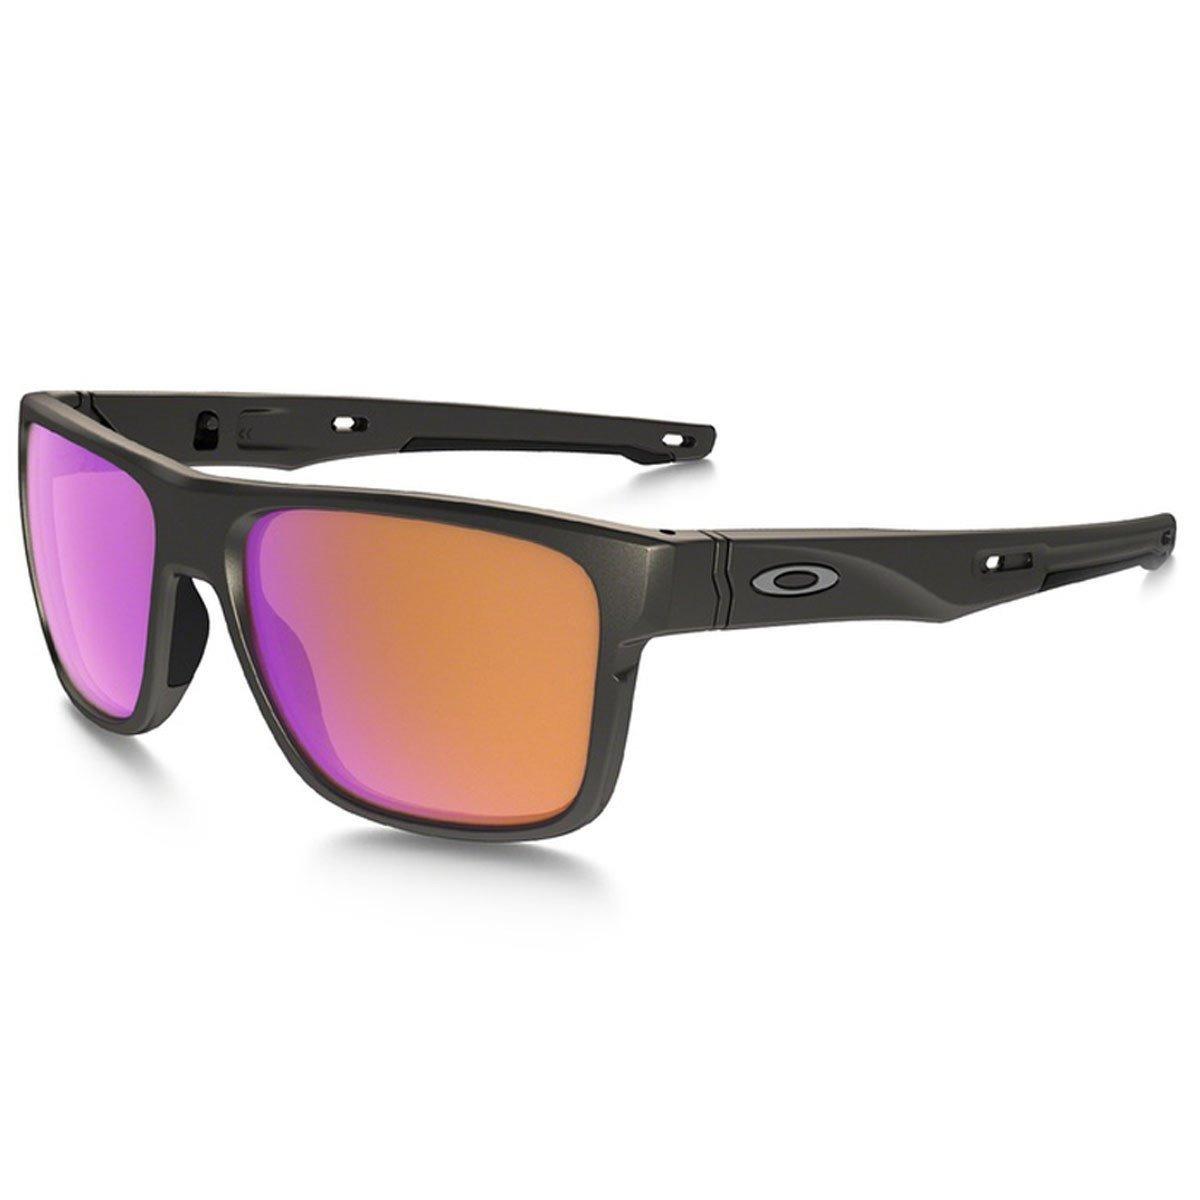 7b81c705dc847 Óculos Sol Oakley Crossrange Steel Prizm Trail Polarizado - R  599 ...